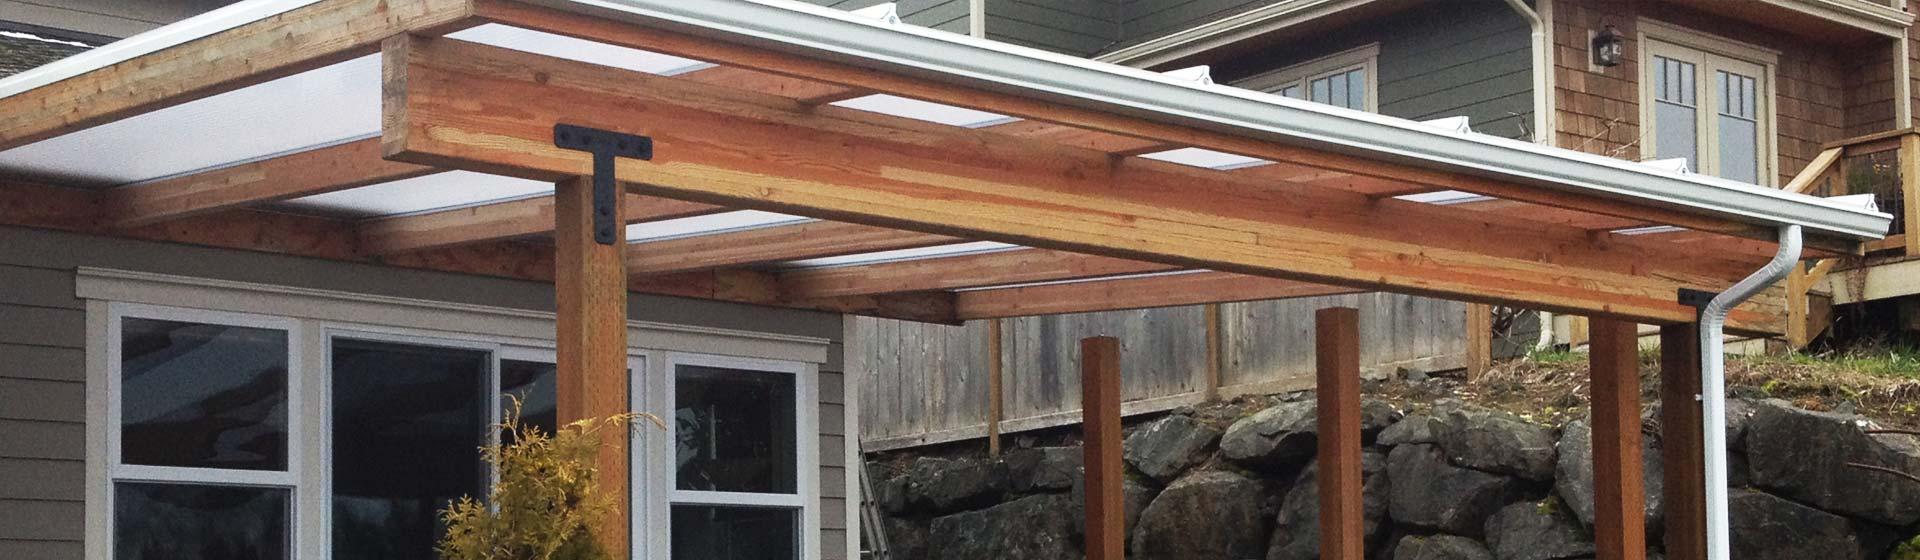 wood-beam-acrylic-patio-covers